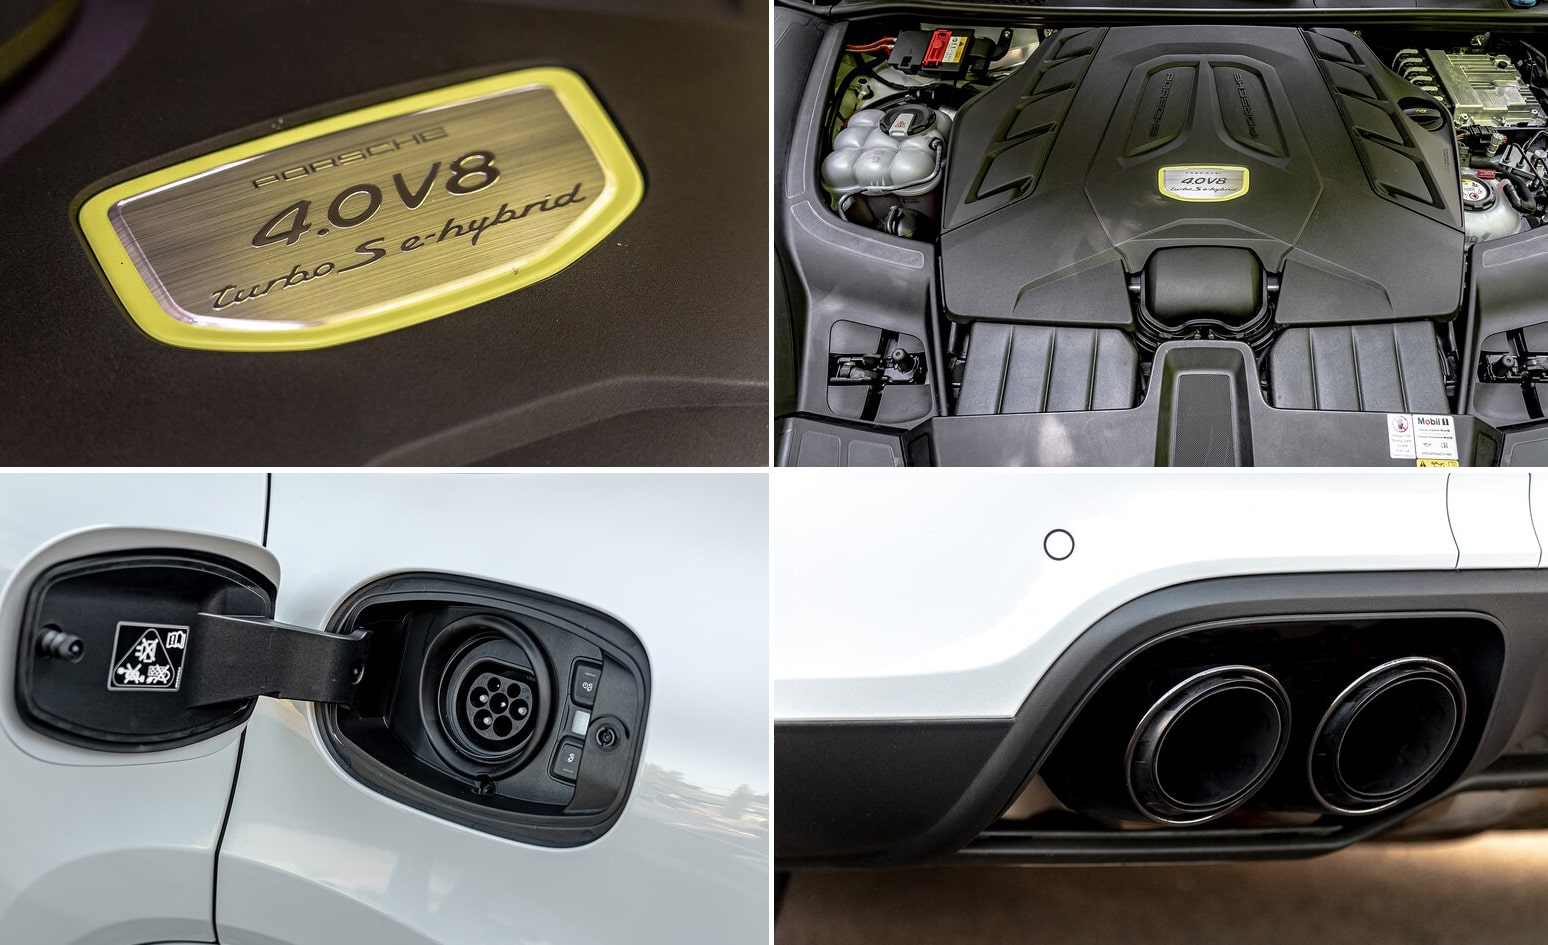 2019-porsche-cayenne-turbo-s-e-hybrid-drive_wsp-min